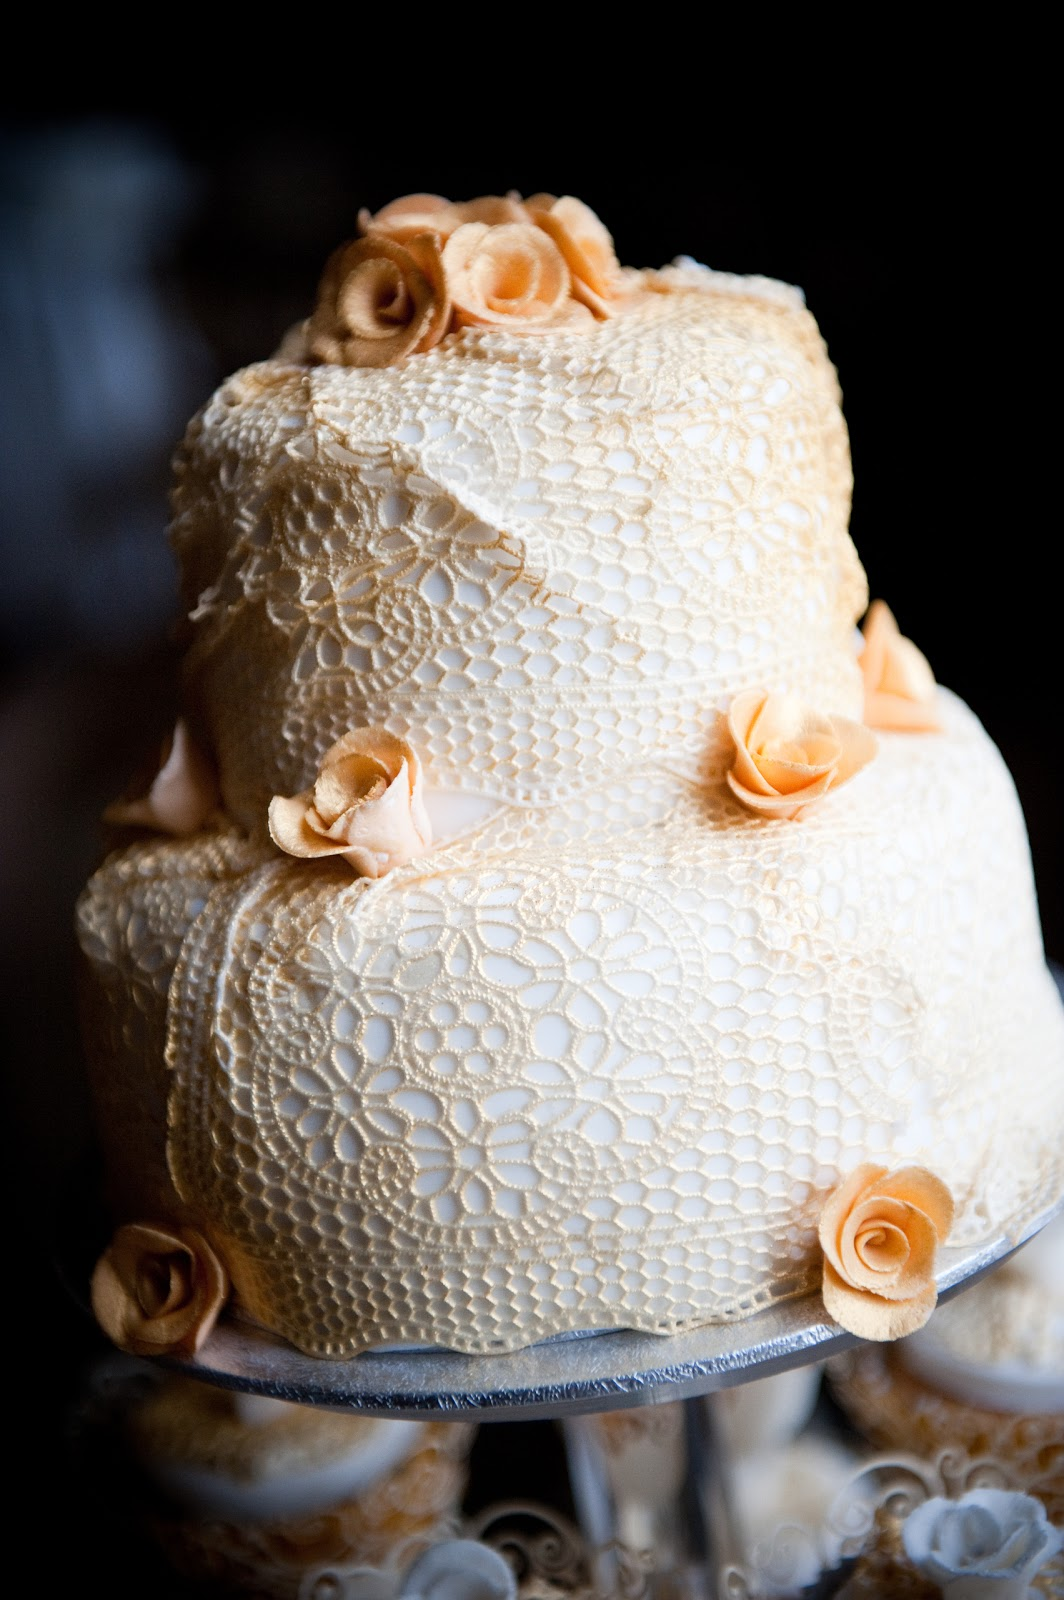 Amorra Weddings: Edible lace? Yes please!